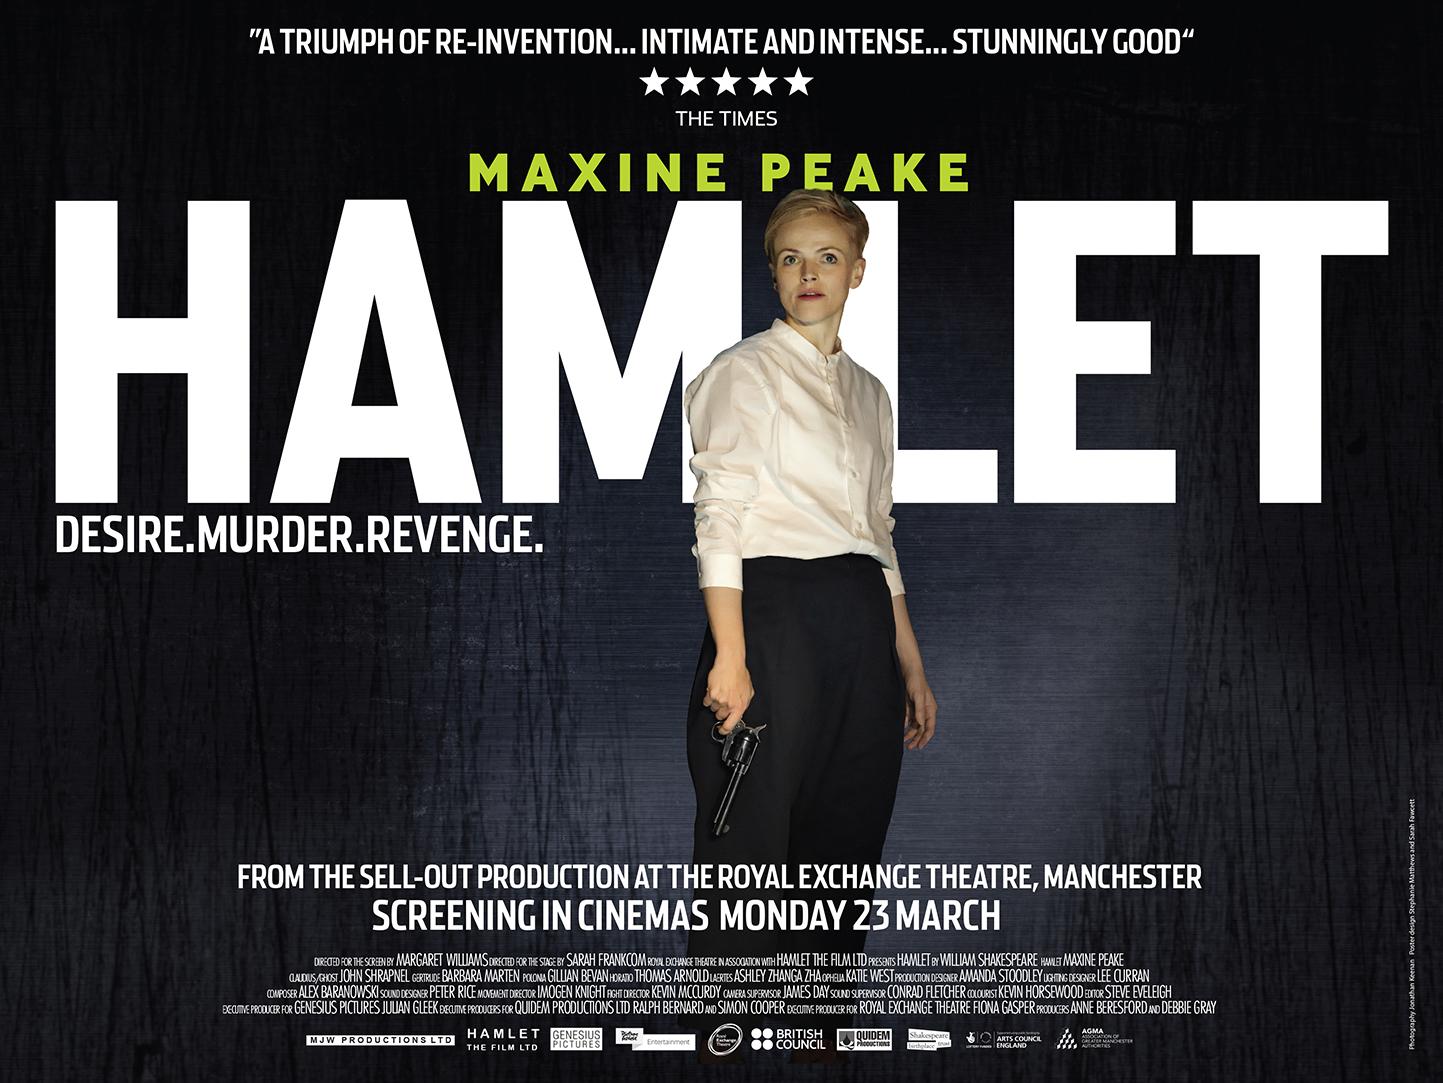 Maxine Peake as HAMLET - In cinemas Monday 23rd March 2015